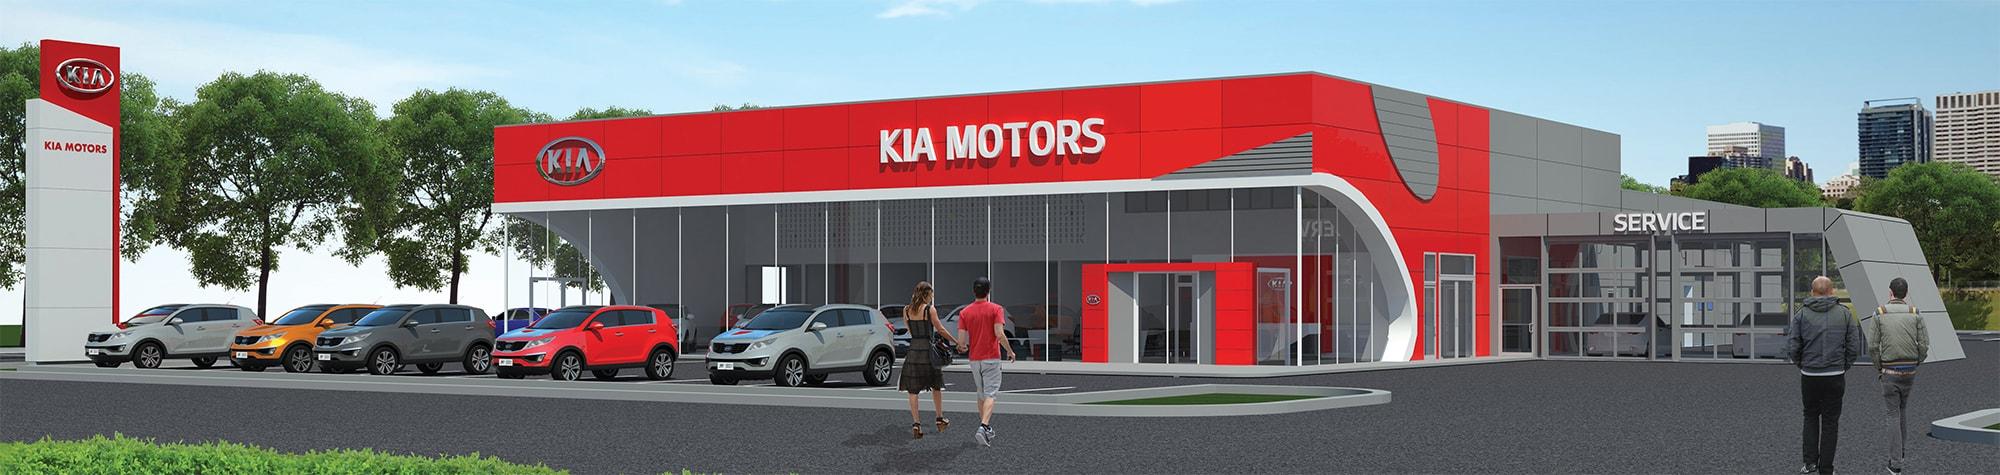 The New Plaza Kia